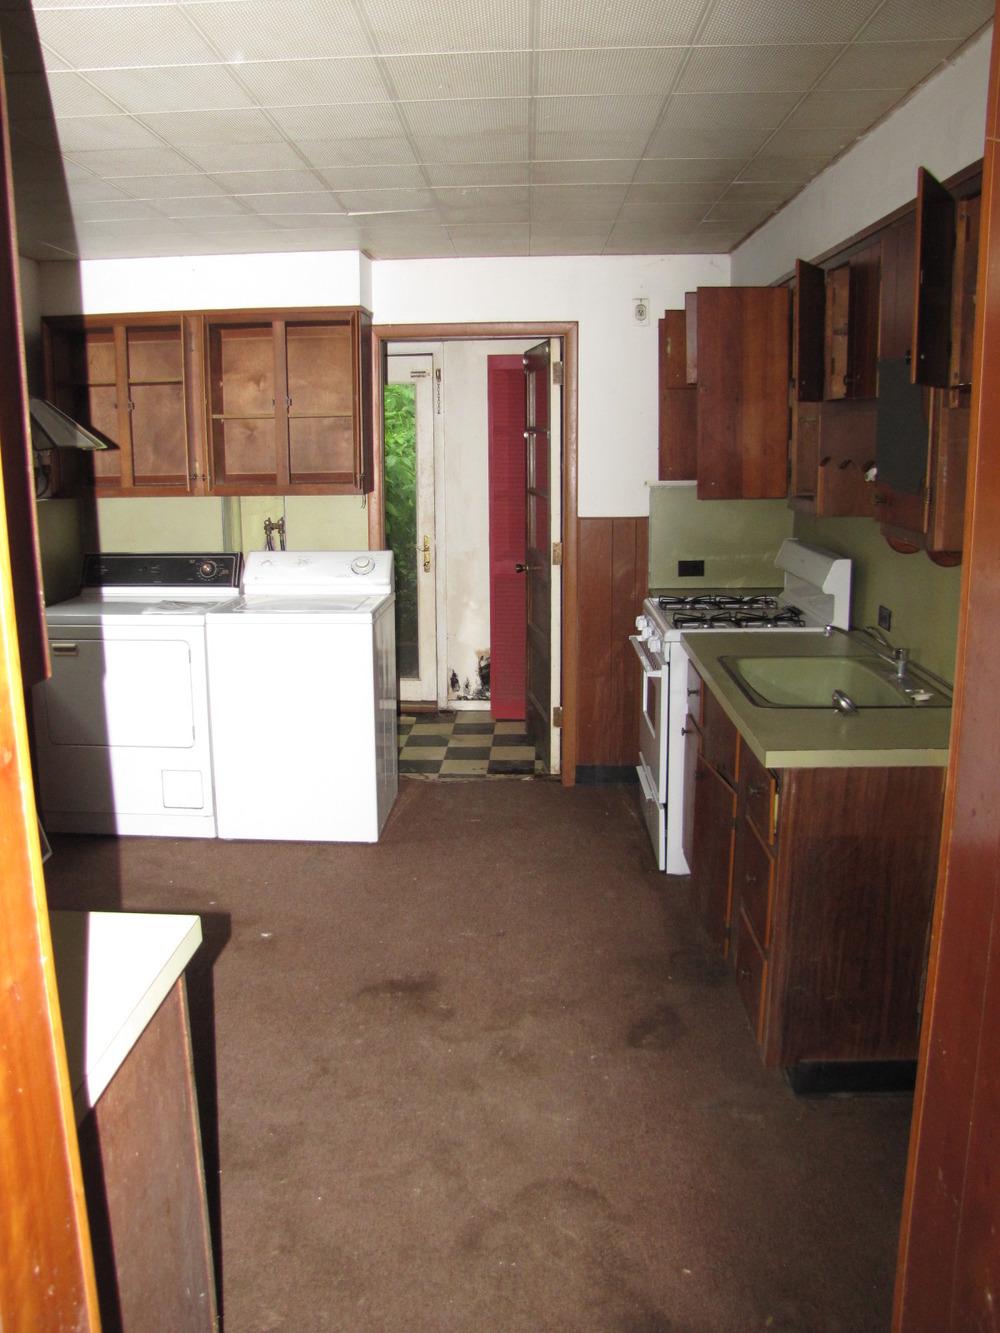 a5 - 3523 sunnyside exist kitchen 2.jpg